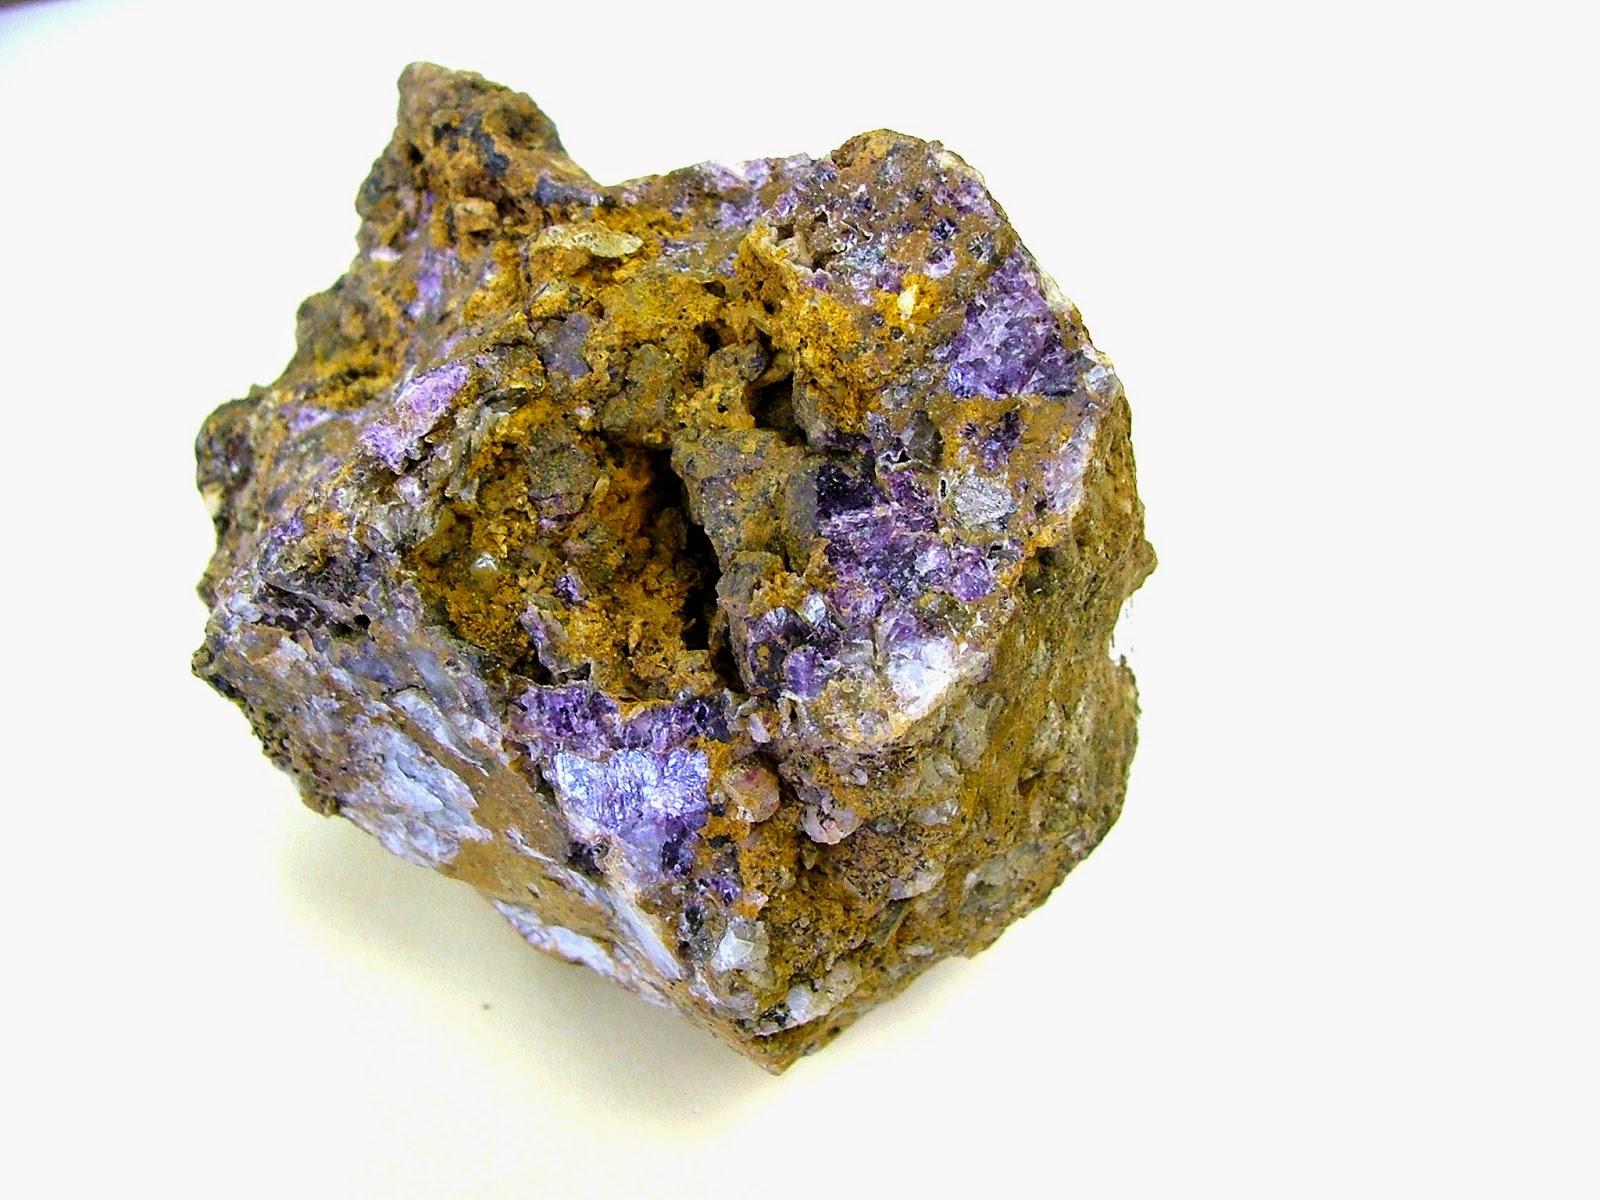 GemHunter's Guide to Gemstones, Minerals & Rocks of Wyoming